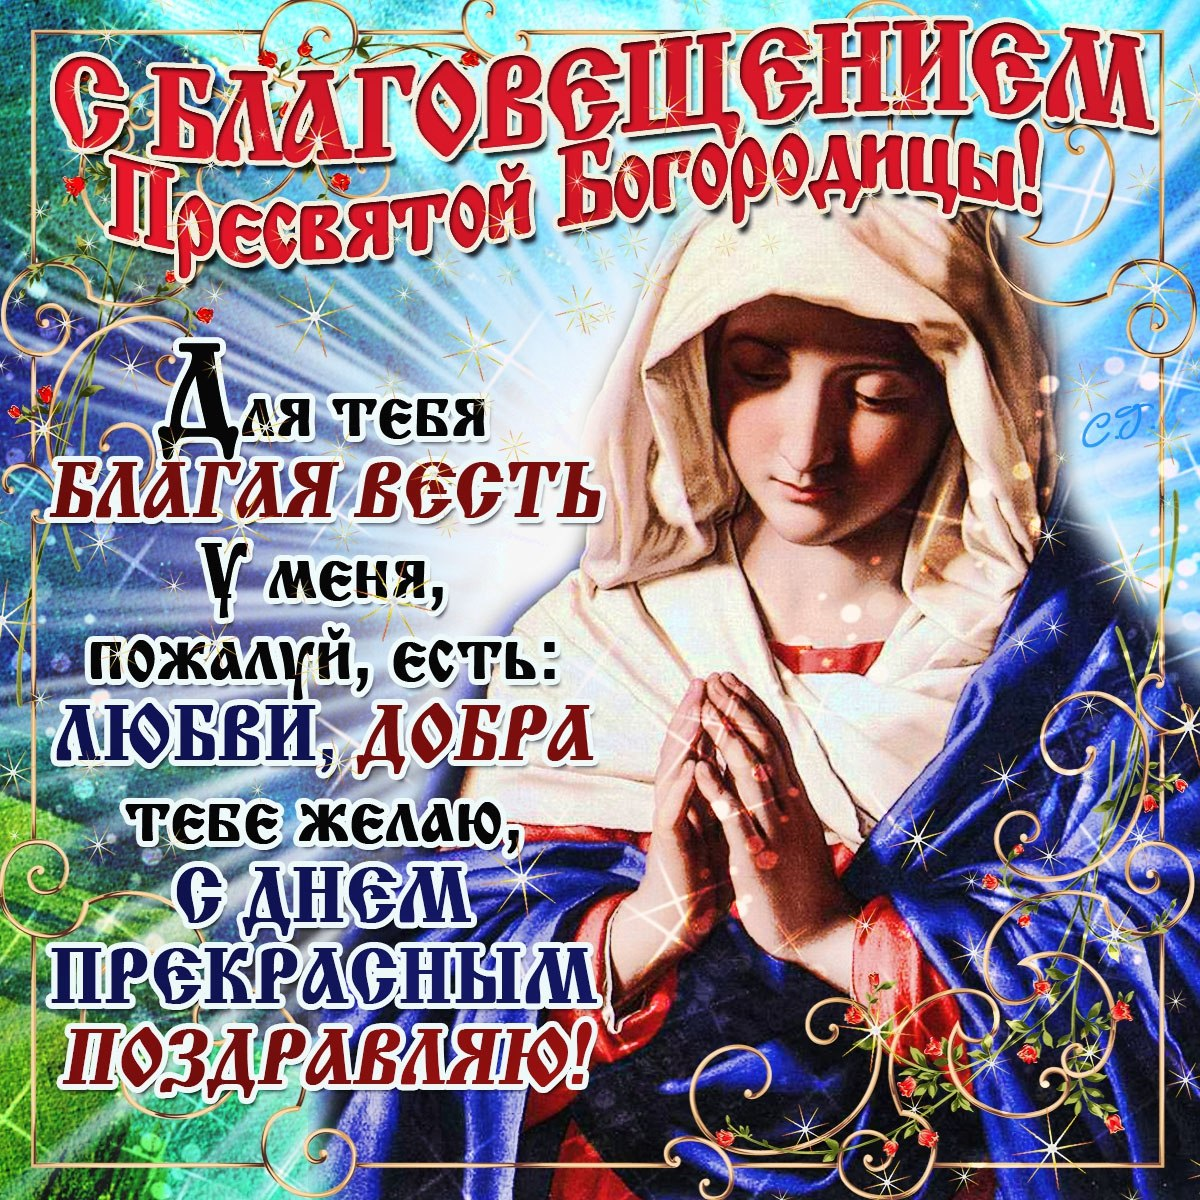 http://pp.vk.me/c307909/v307909786/9328/tj-hAD1zf3k.jpg